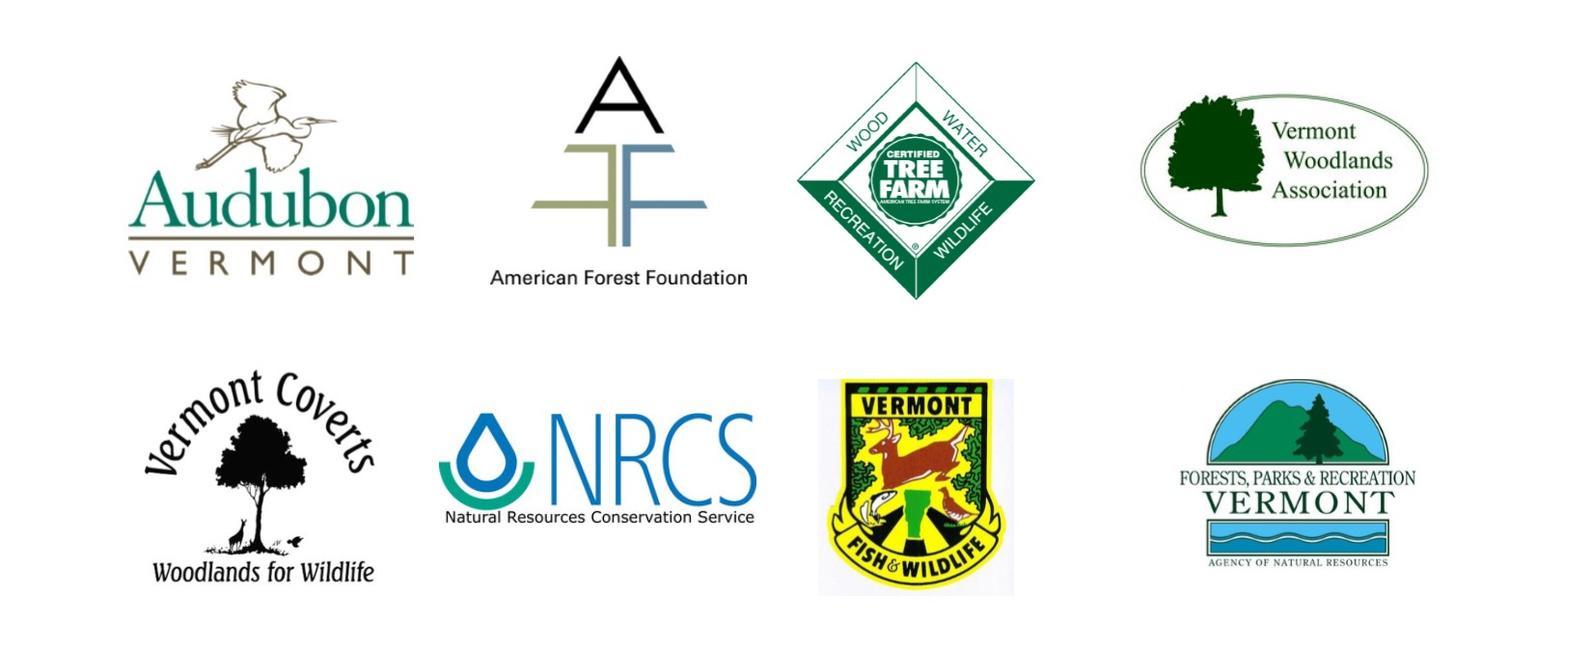 woods_wildlife_and_warblers_partner logos